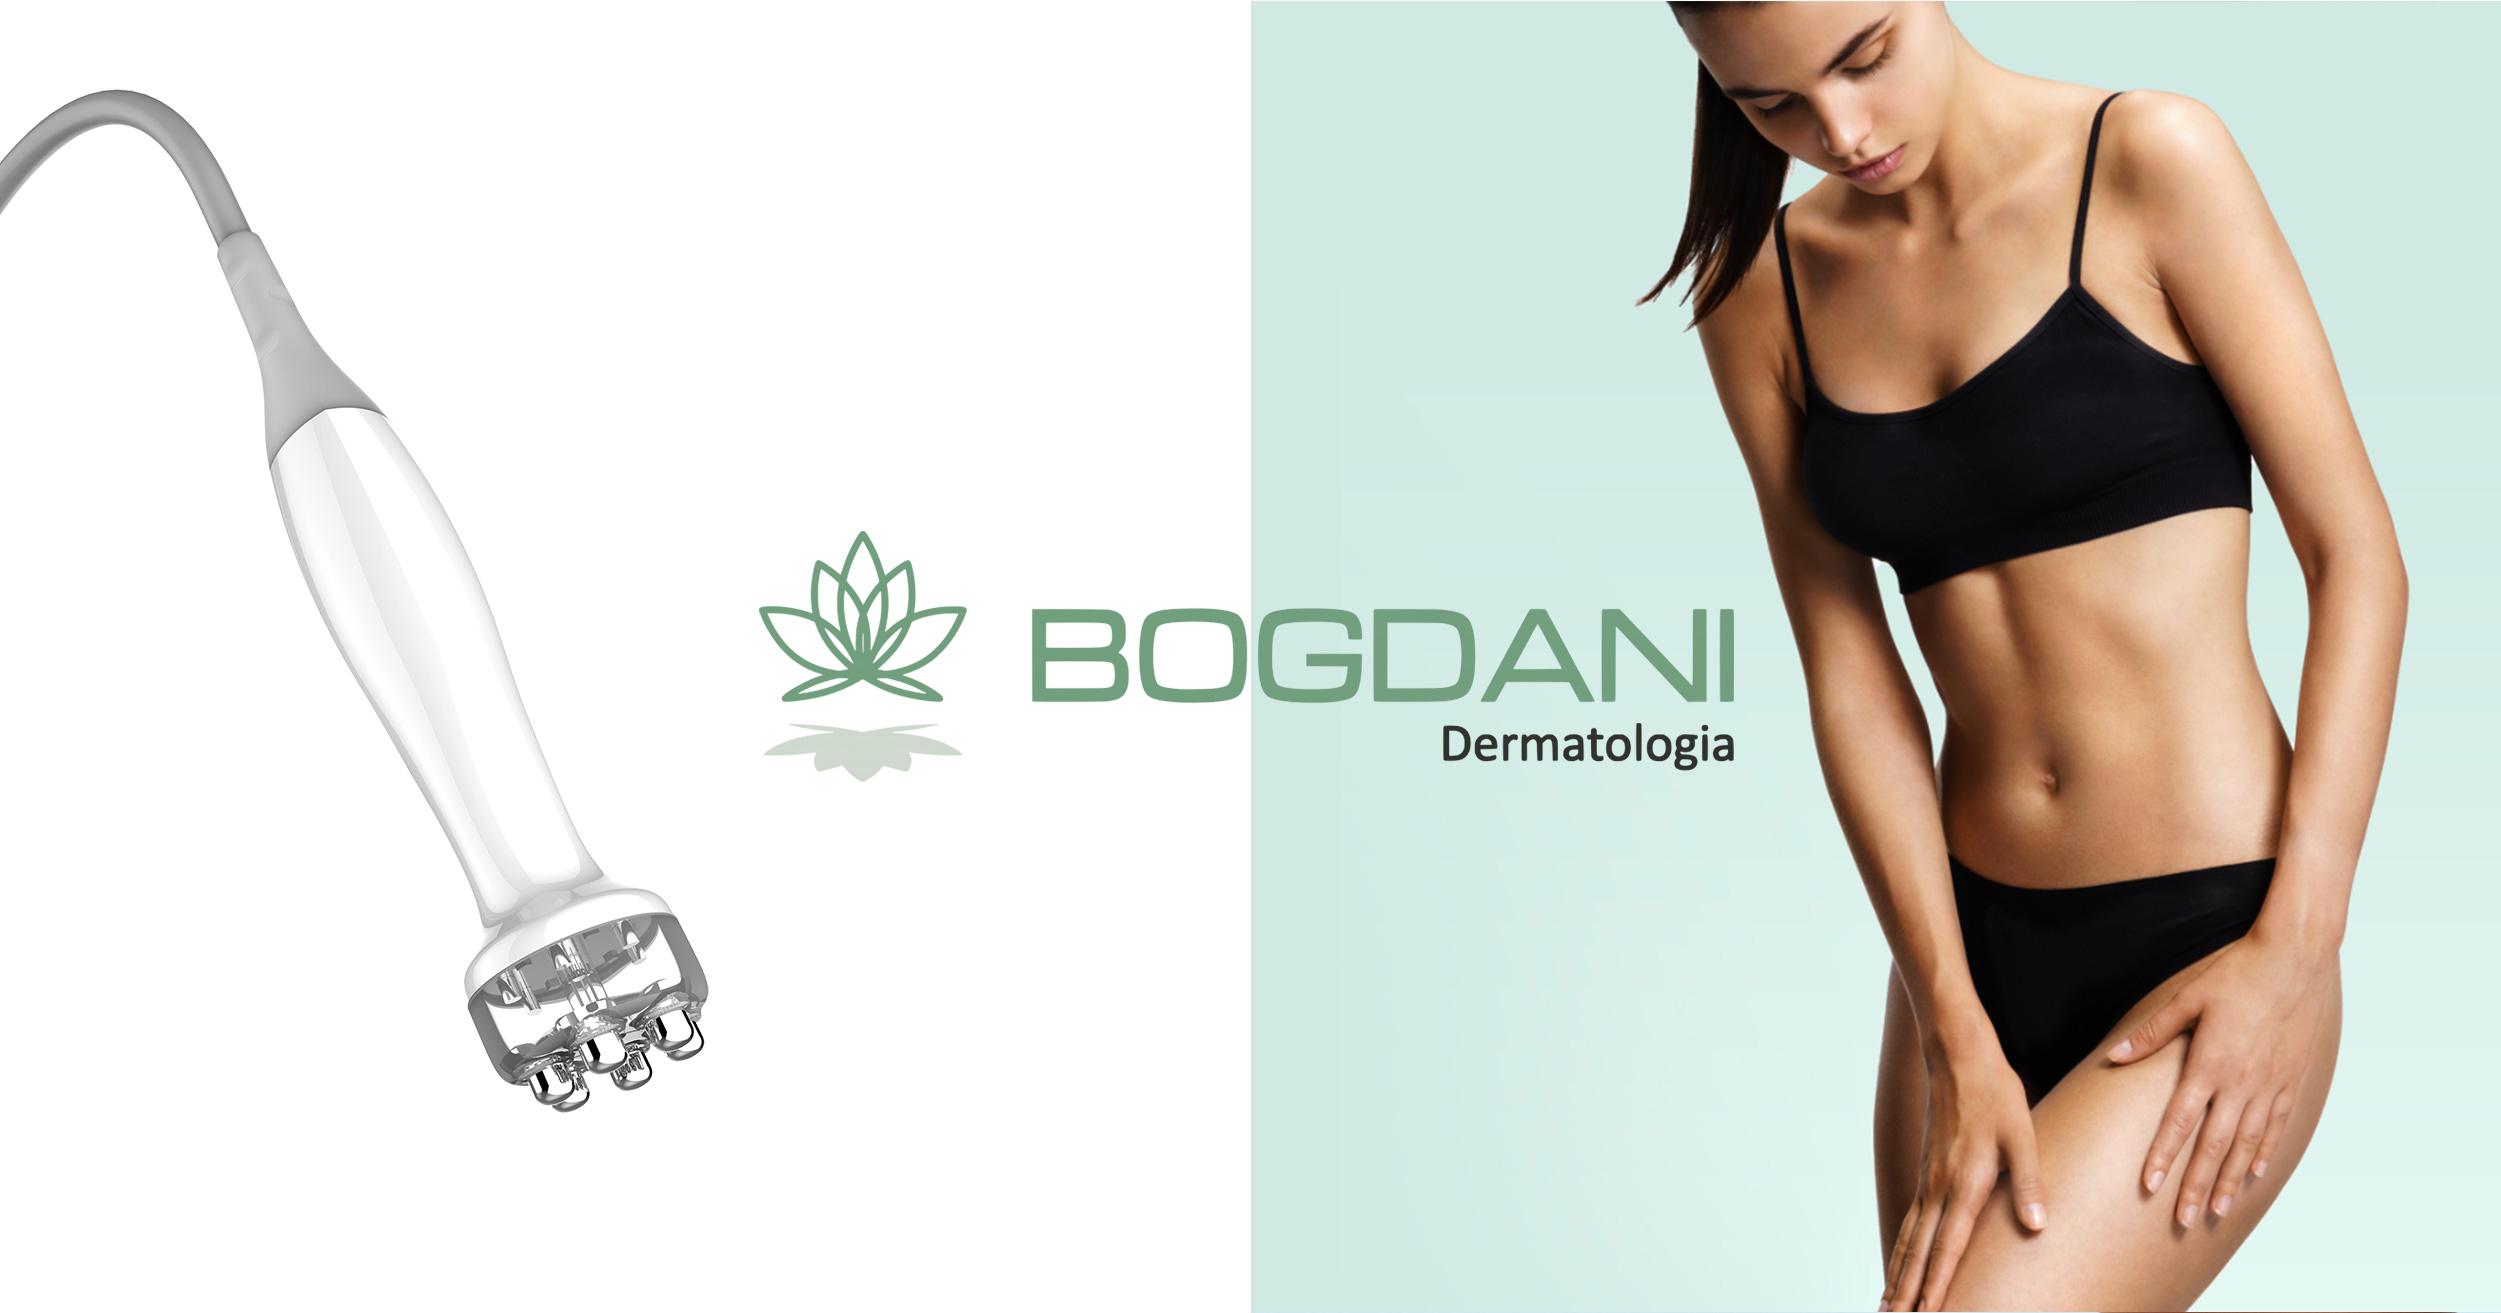 bogdani_1